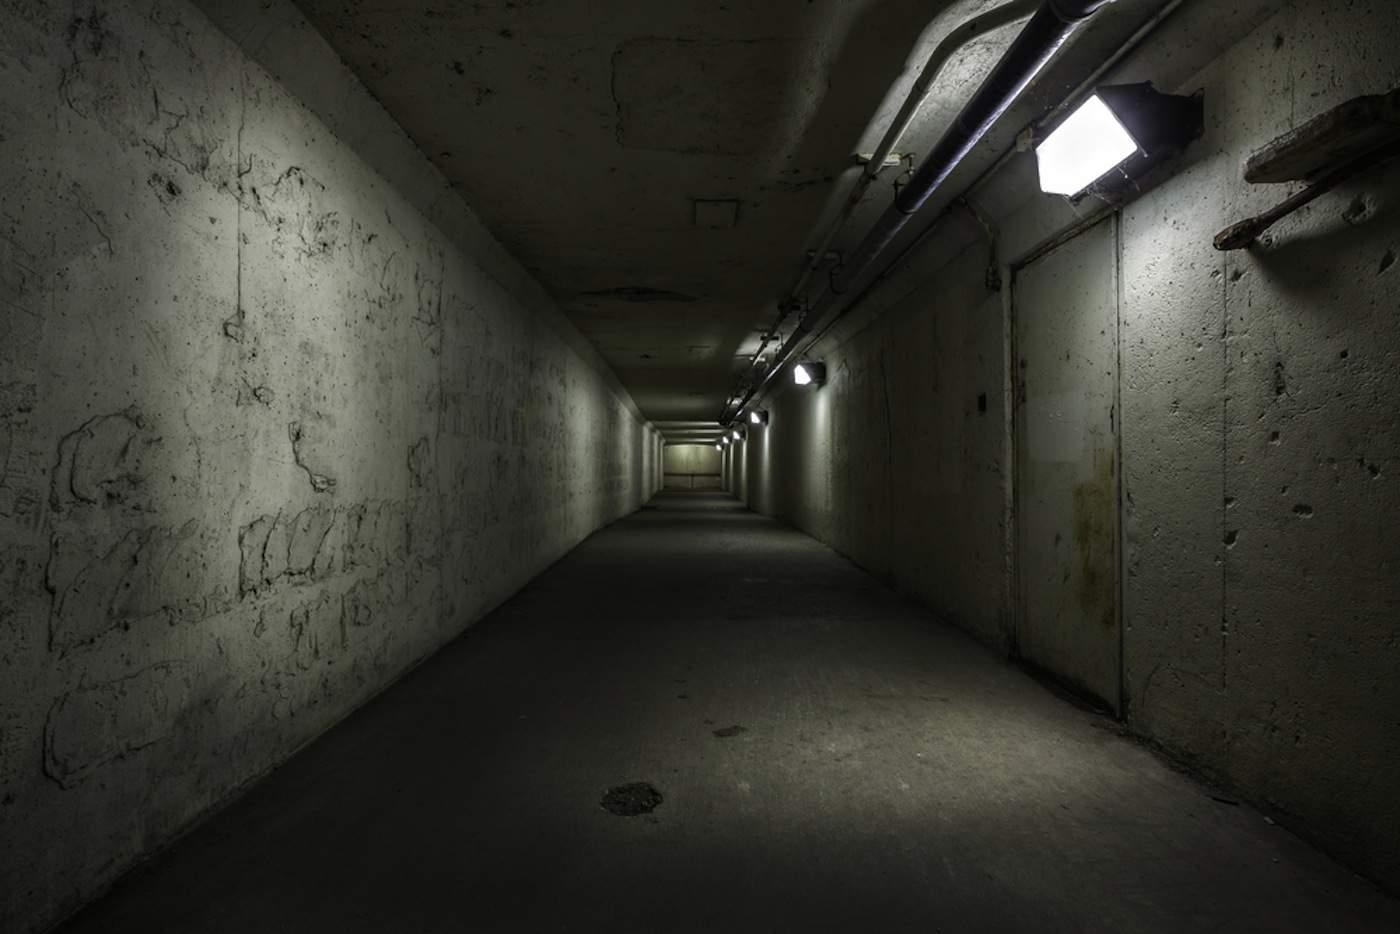 pictures secret tunnel explored - photo #15